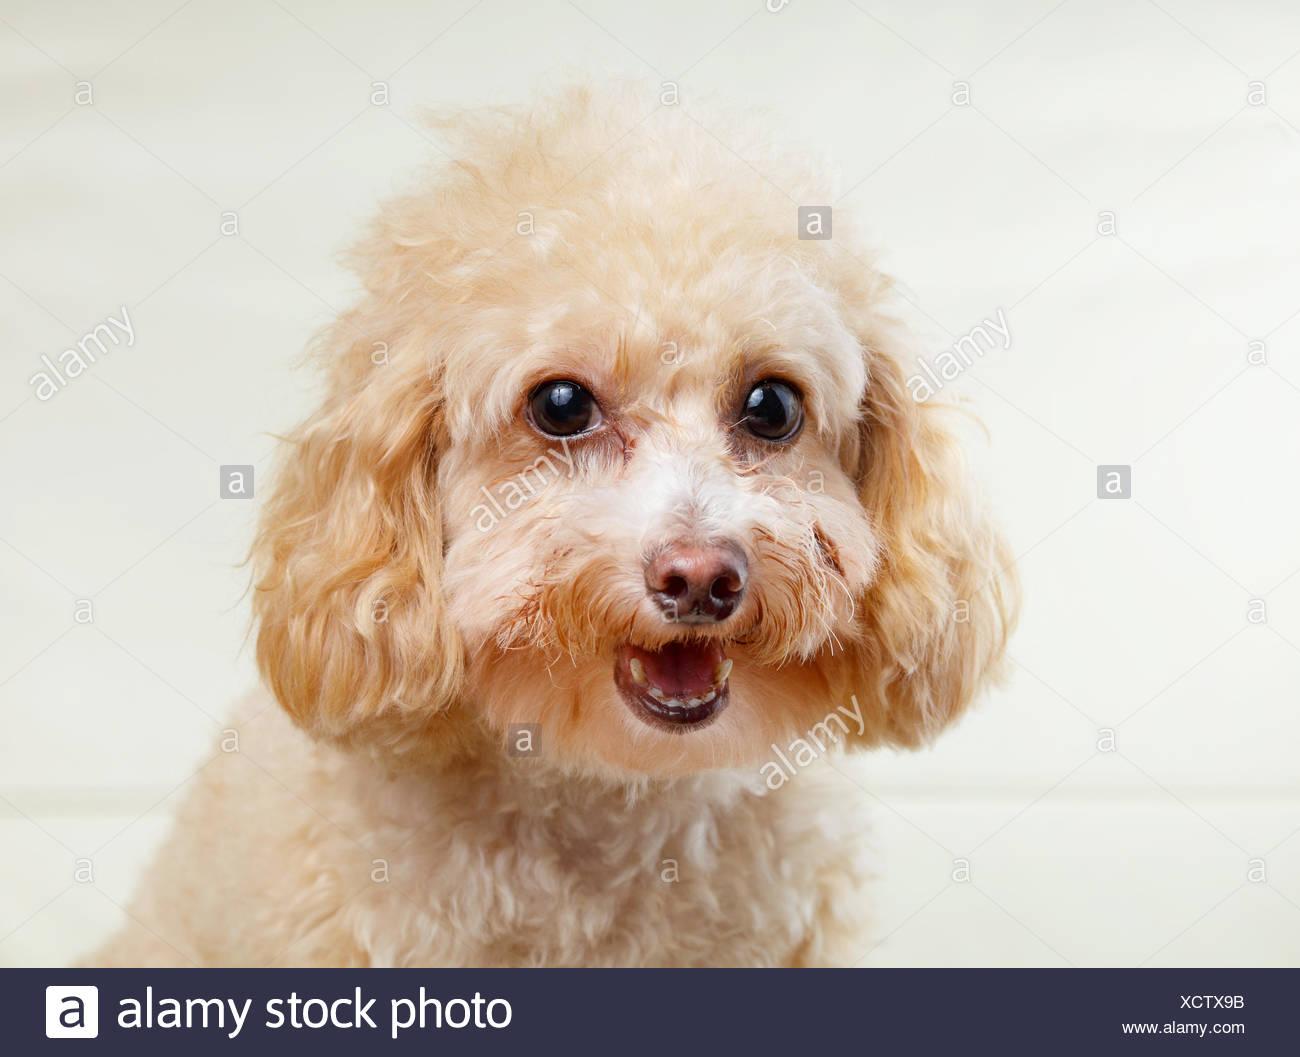 Toy poodle eye discharge-5544